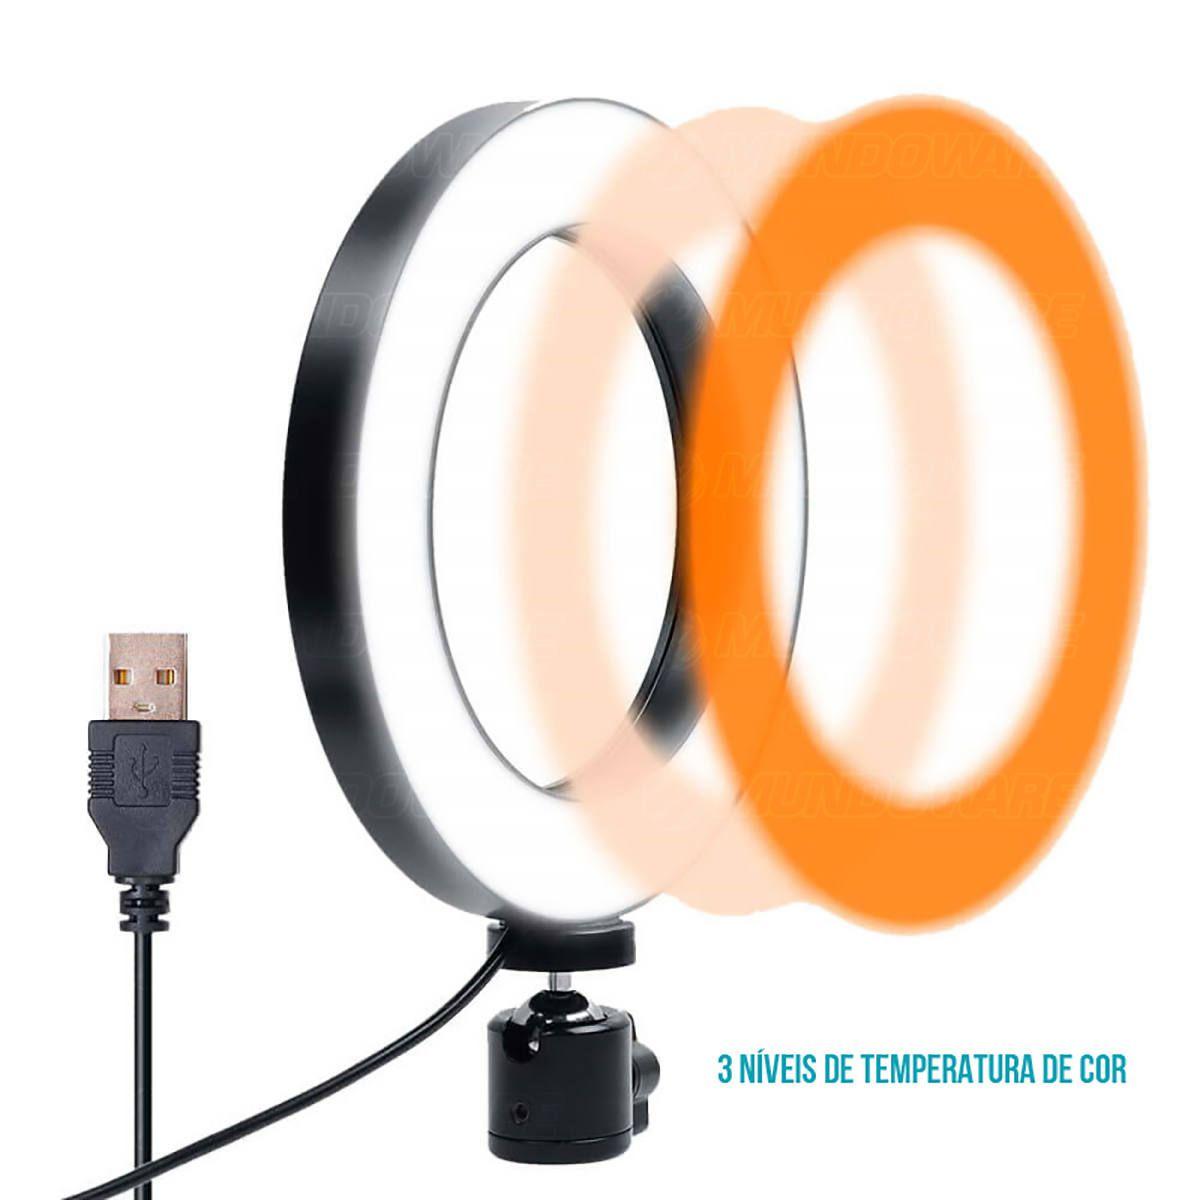 Ring Light de LED 10 Polegadas p/ Foto Vídeo 120 LEDs Dimmer 3200K à 5600K Tripé de Mesa Iluminador em 3 Cores R10W12